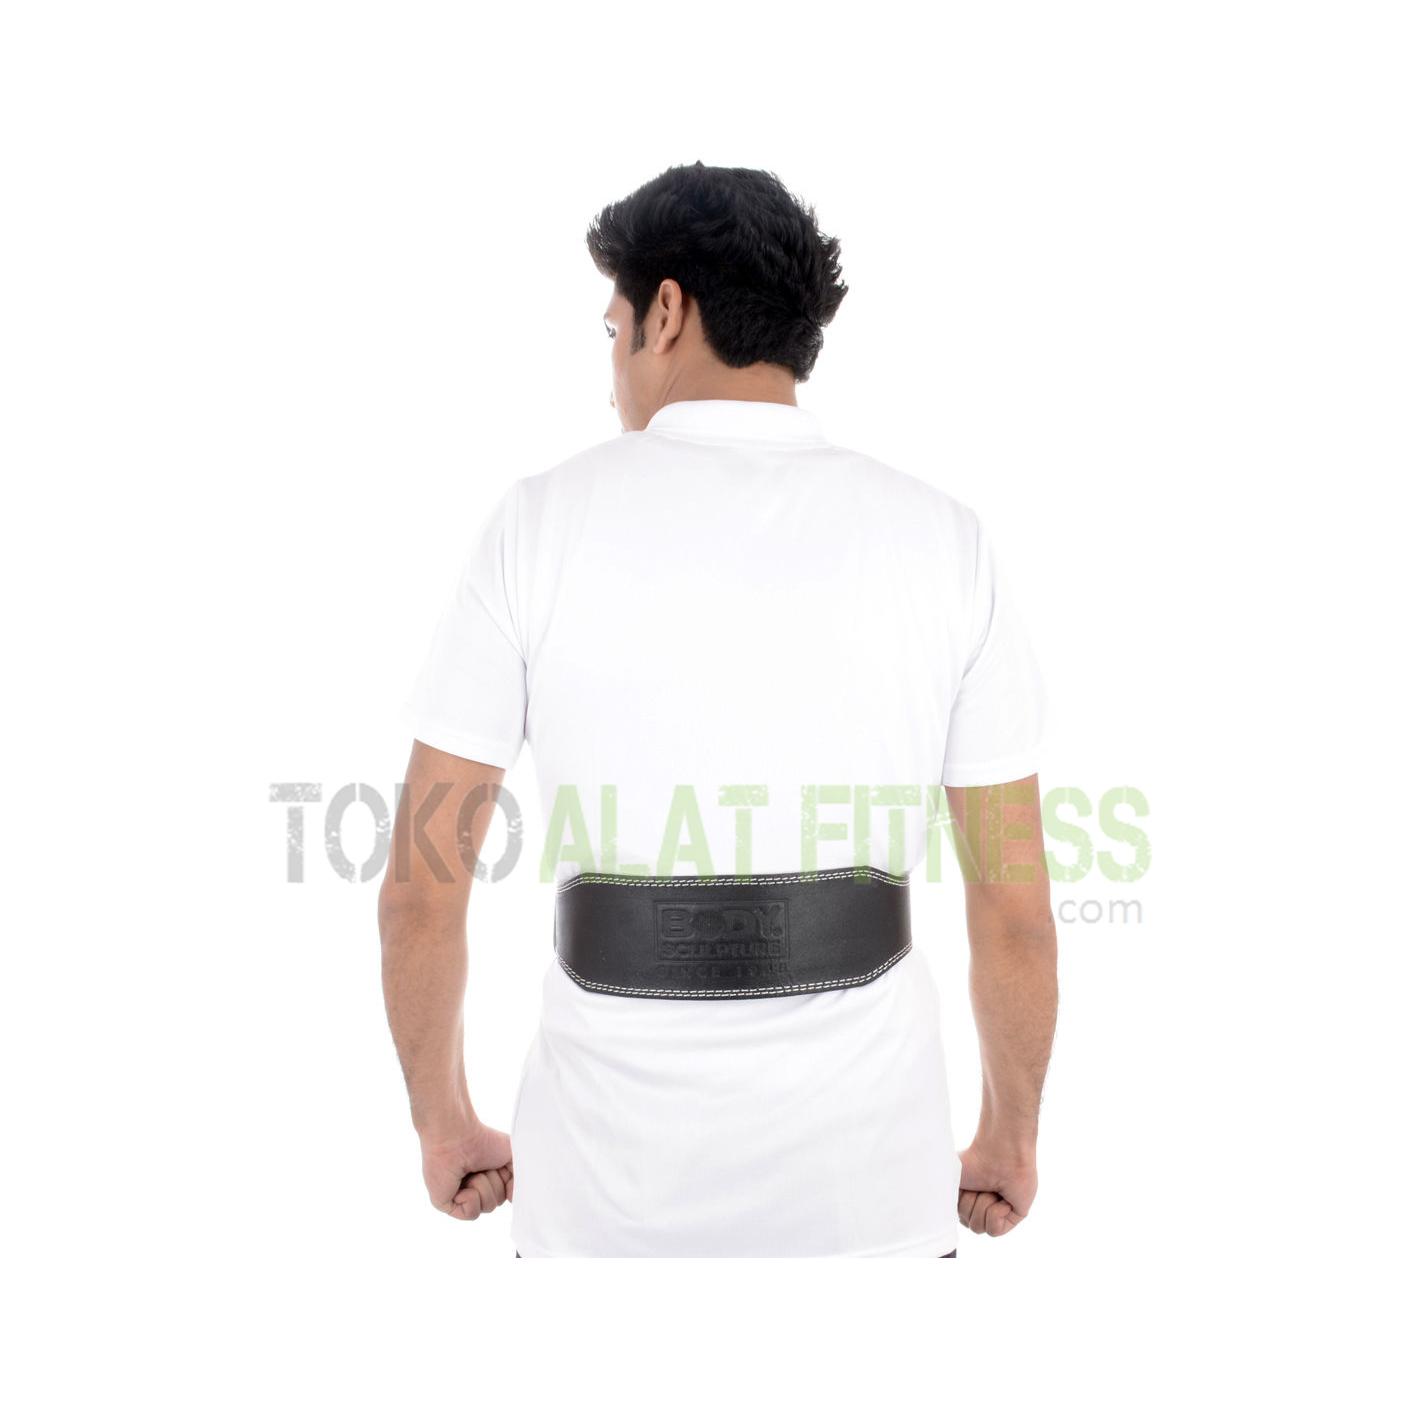 sabuk kulit bs2 - Sabuk Fitness Kulit (Weight Lifting Belt) M Hitam Body Sculpture